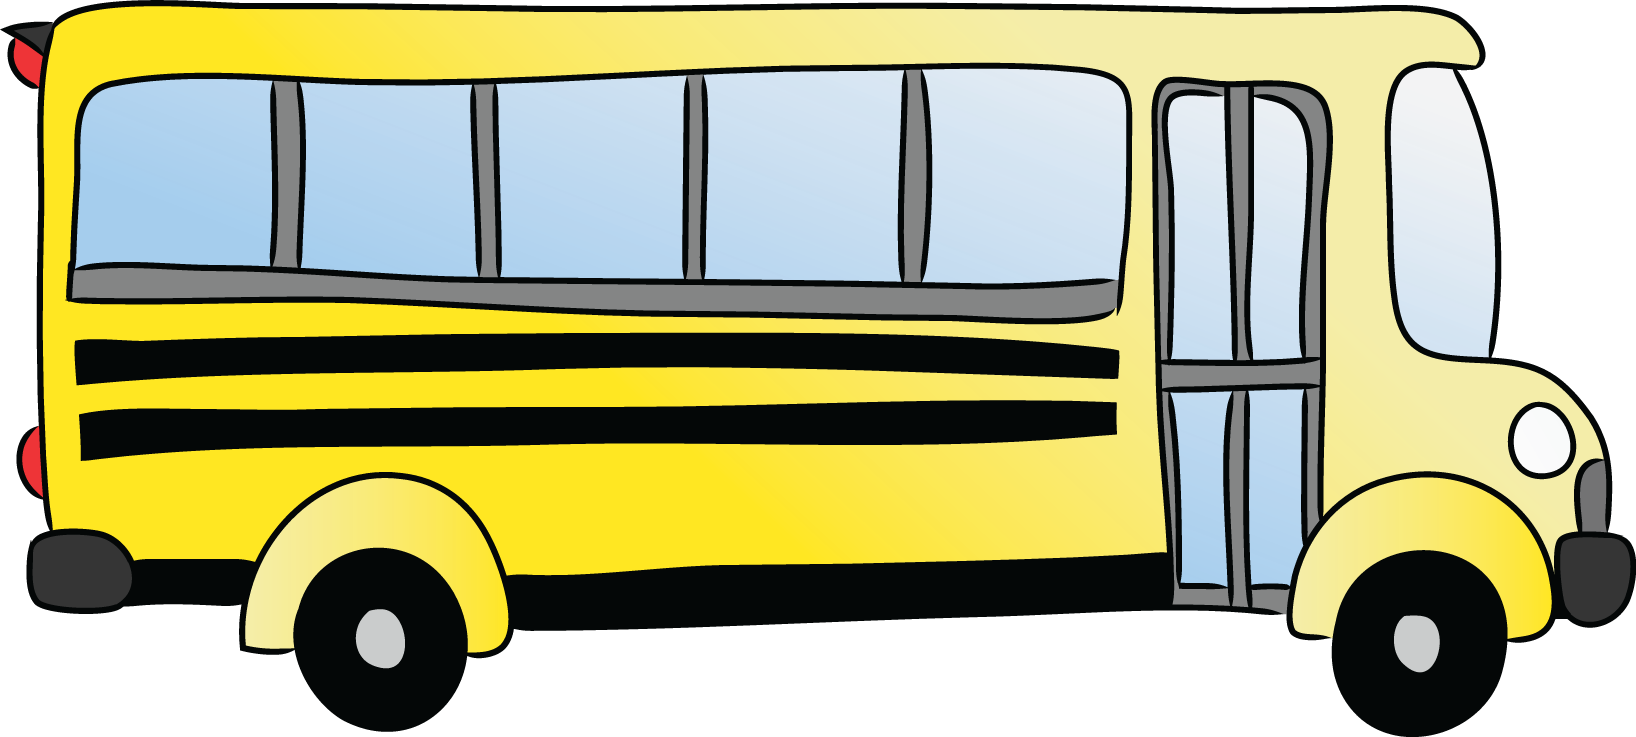 1636x737 School Bus Clipart Kid